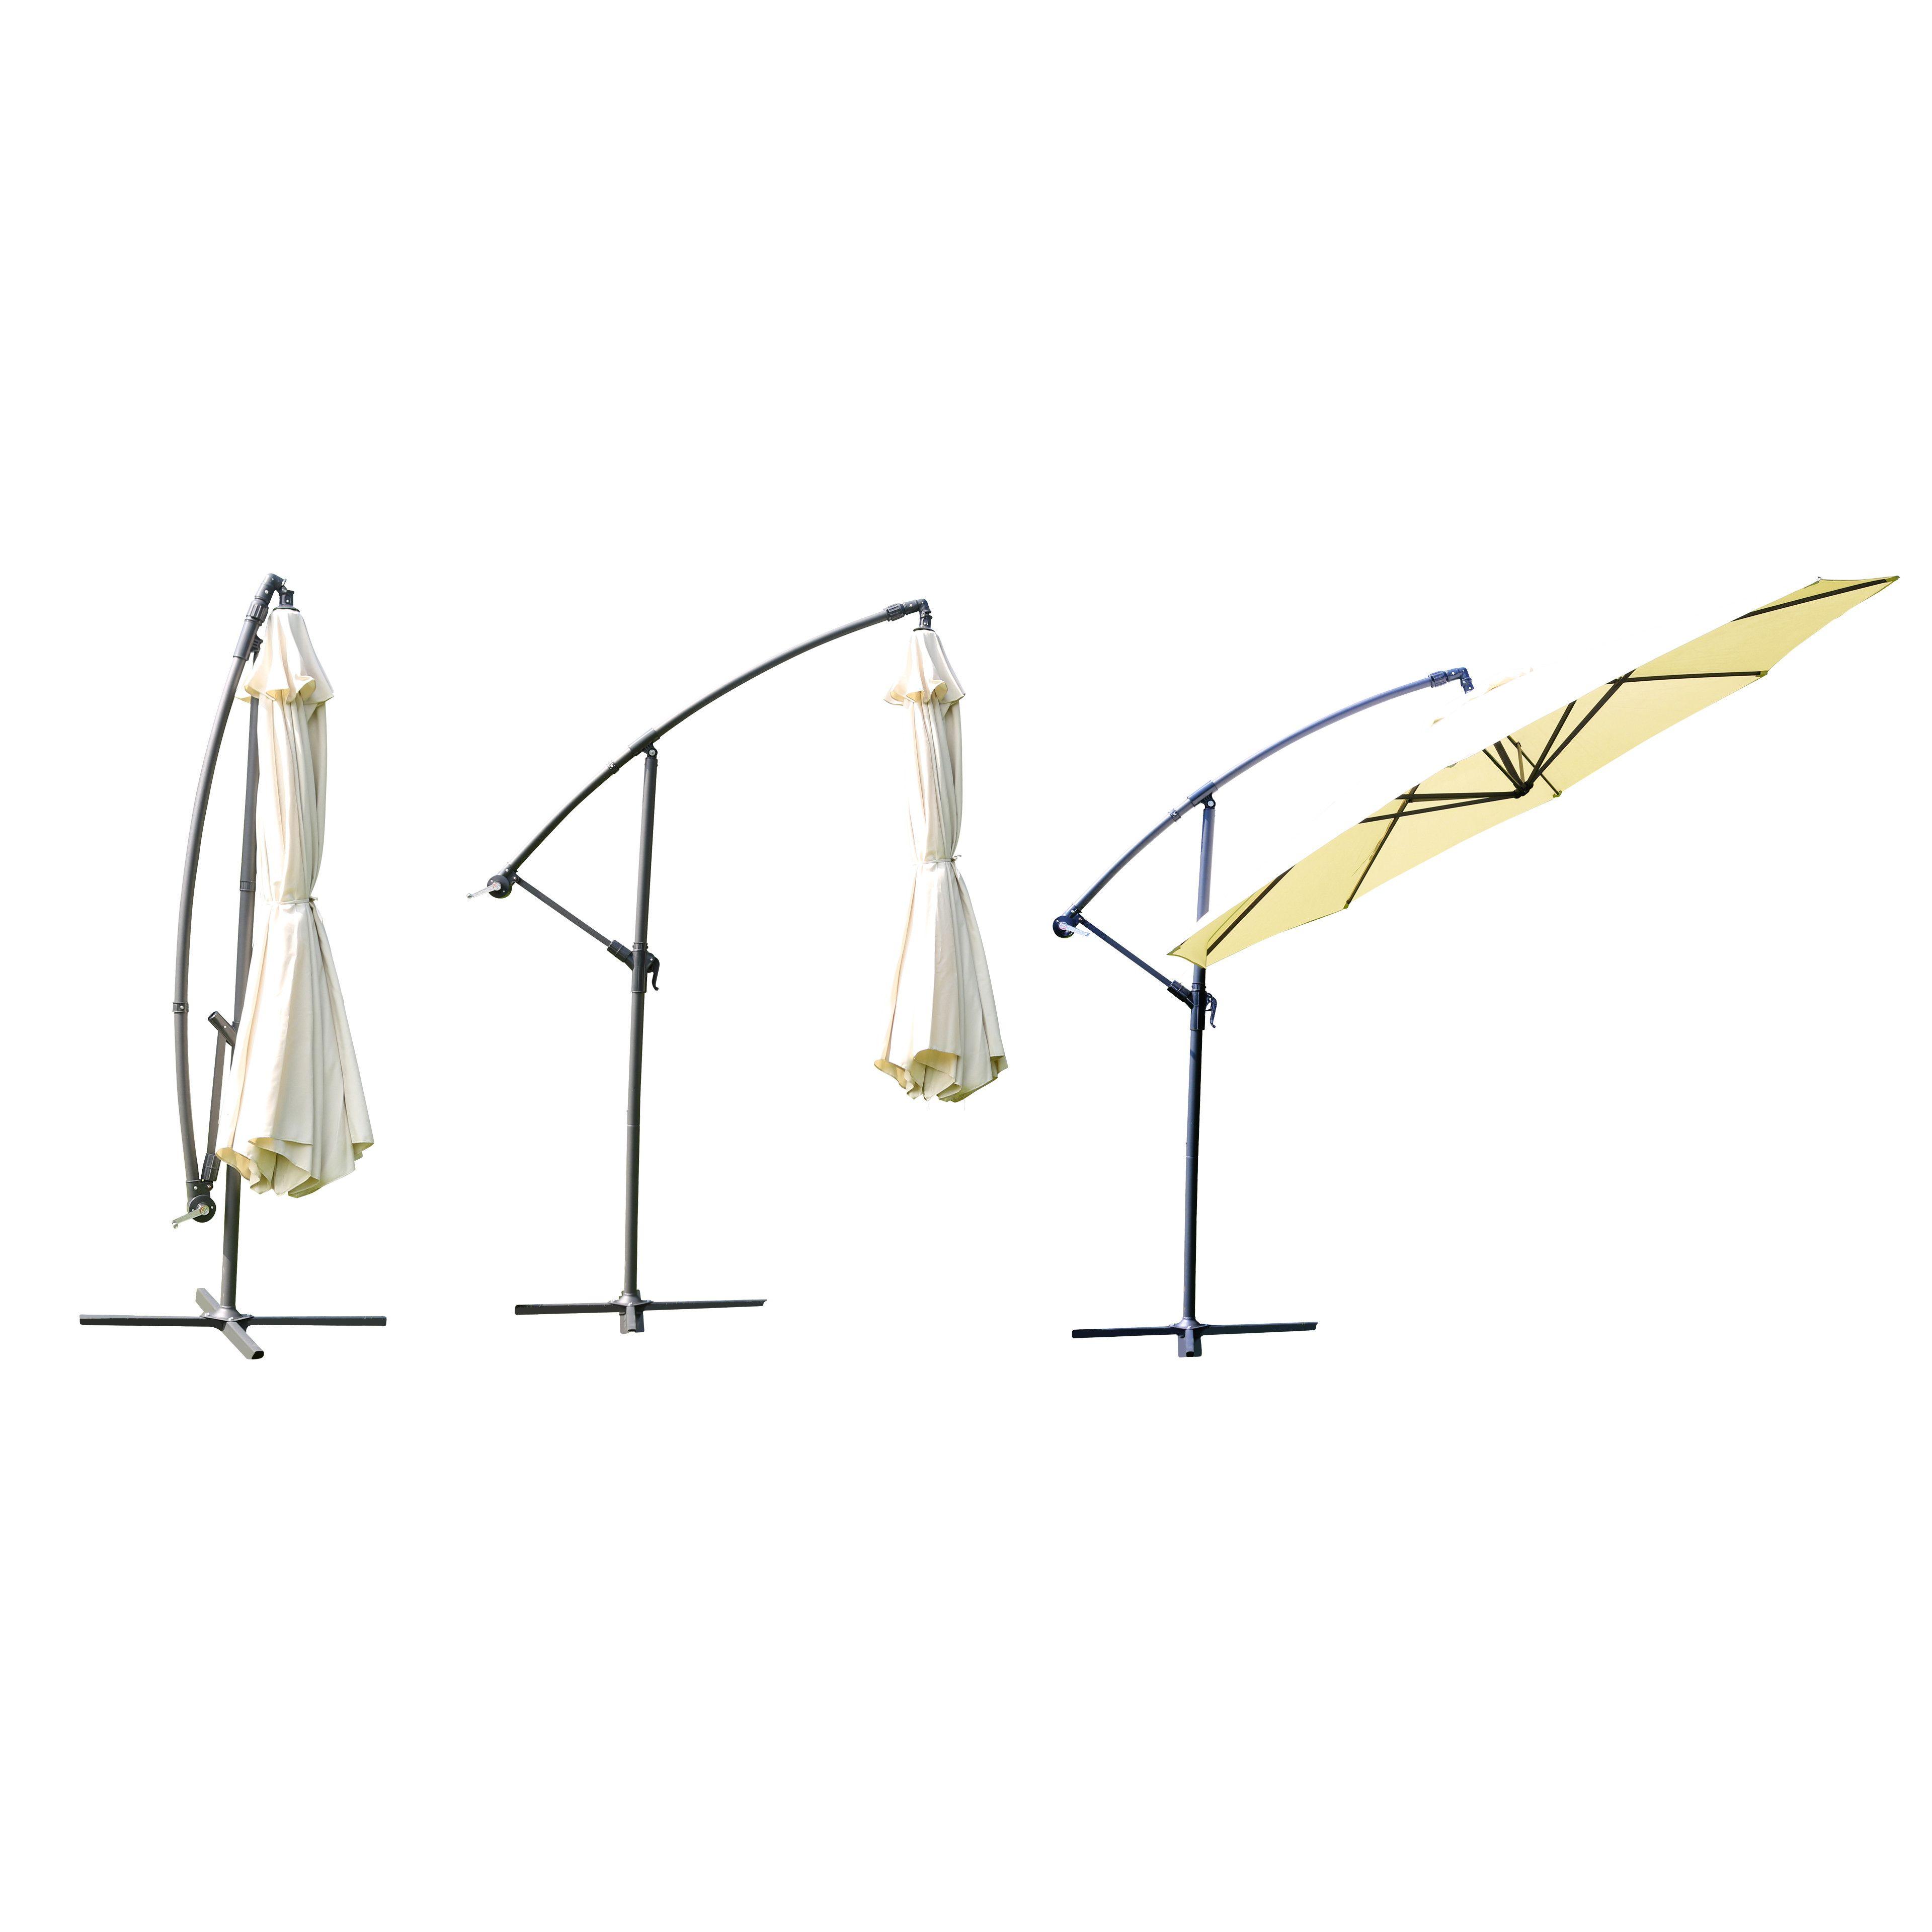 parasol 3 5 meter simple parasol belvedere m round white parasol belvedere m round with parasol. Black Bedroom Furniture Sets. Home Design Ideas